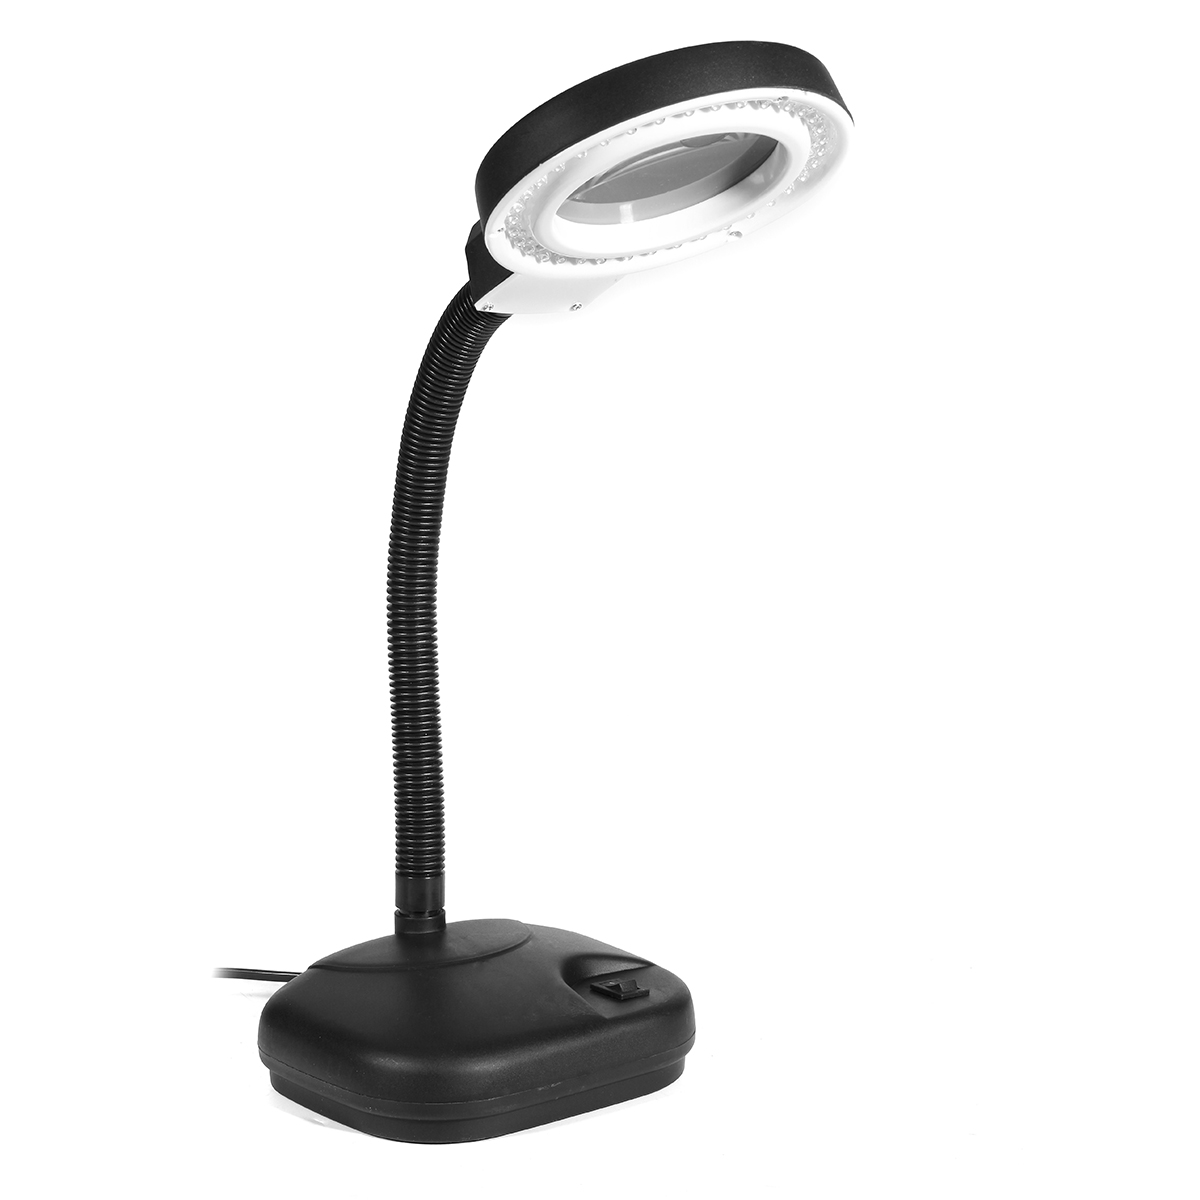 Multi-function 40 LED Desktop Magnifying Lamp 5X 10X Magnifier LED Desk Light Daylight Craft Glass Table Lamp